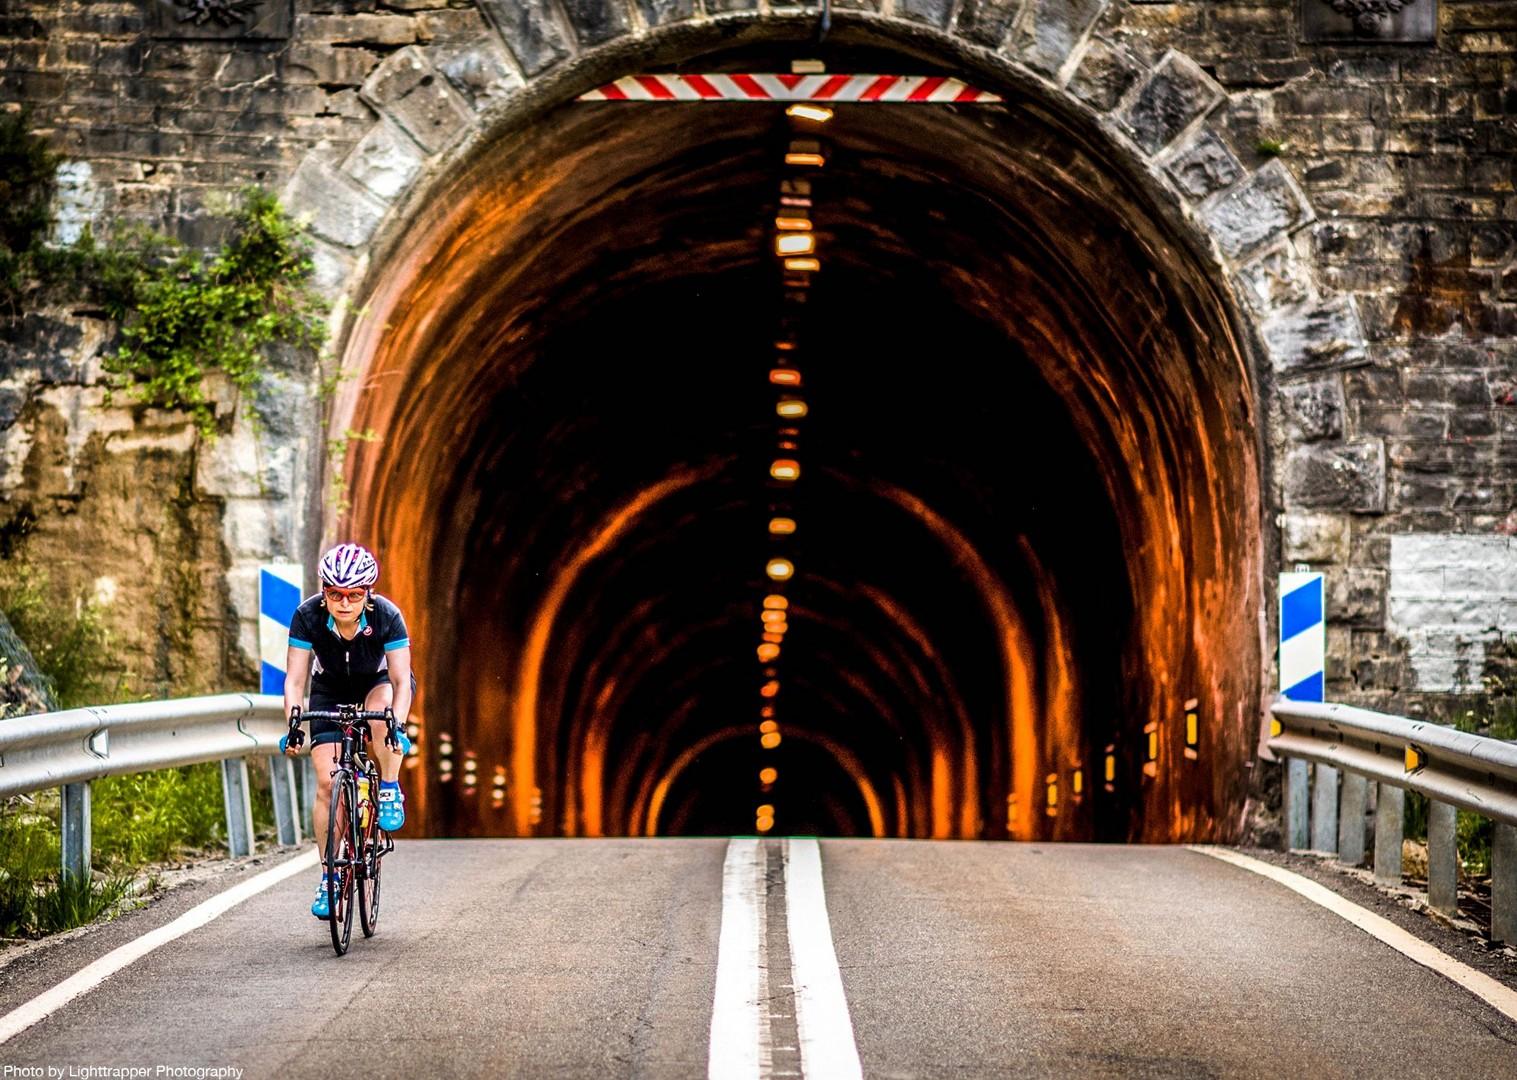 spain-cycling-road-guided-holiday-coast-to-coast-pyrenees.jpg - NEW! Spain - Spanish Pyrenees Coast to Coast - Road Cycling